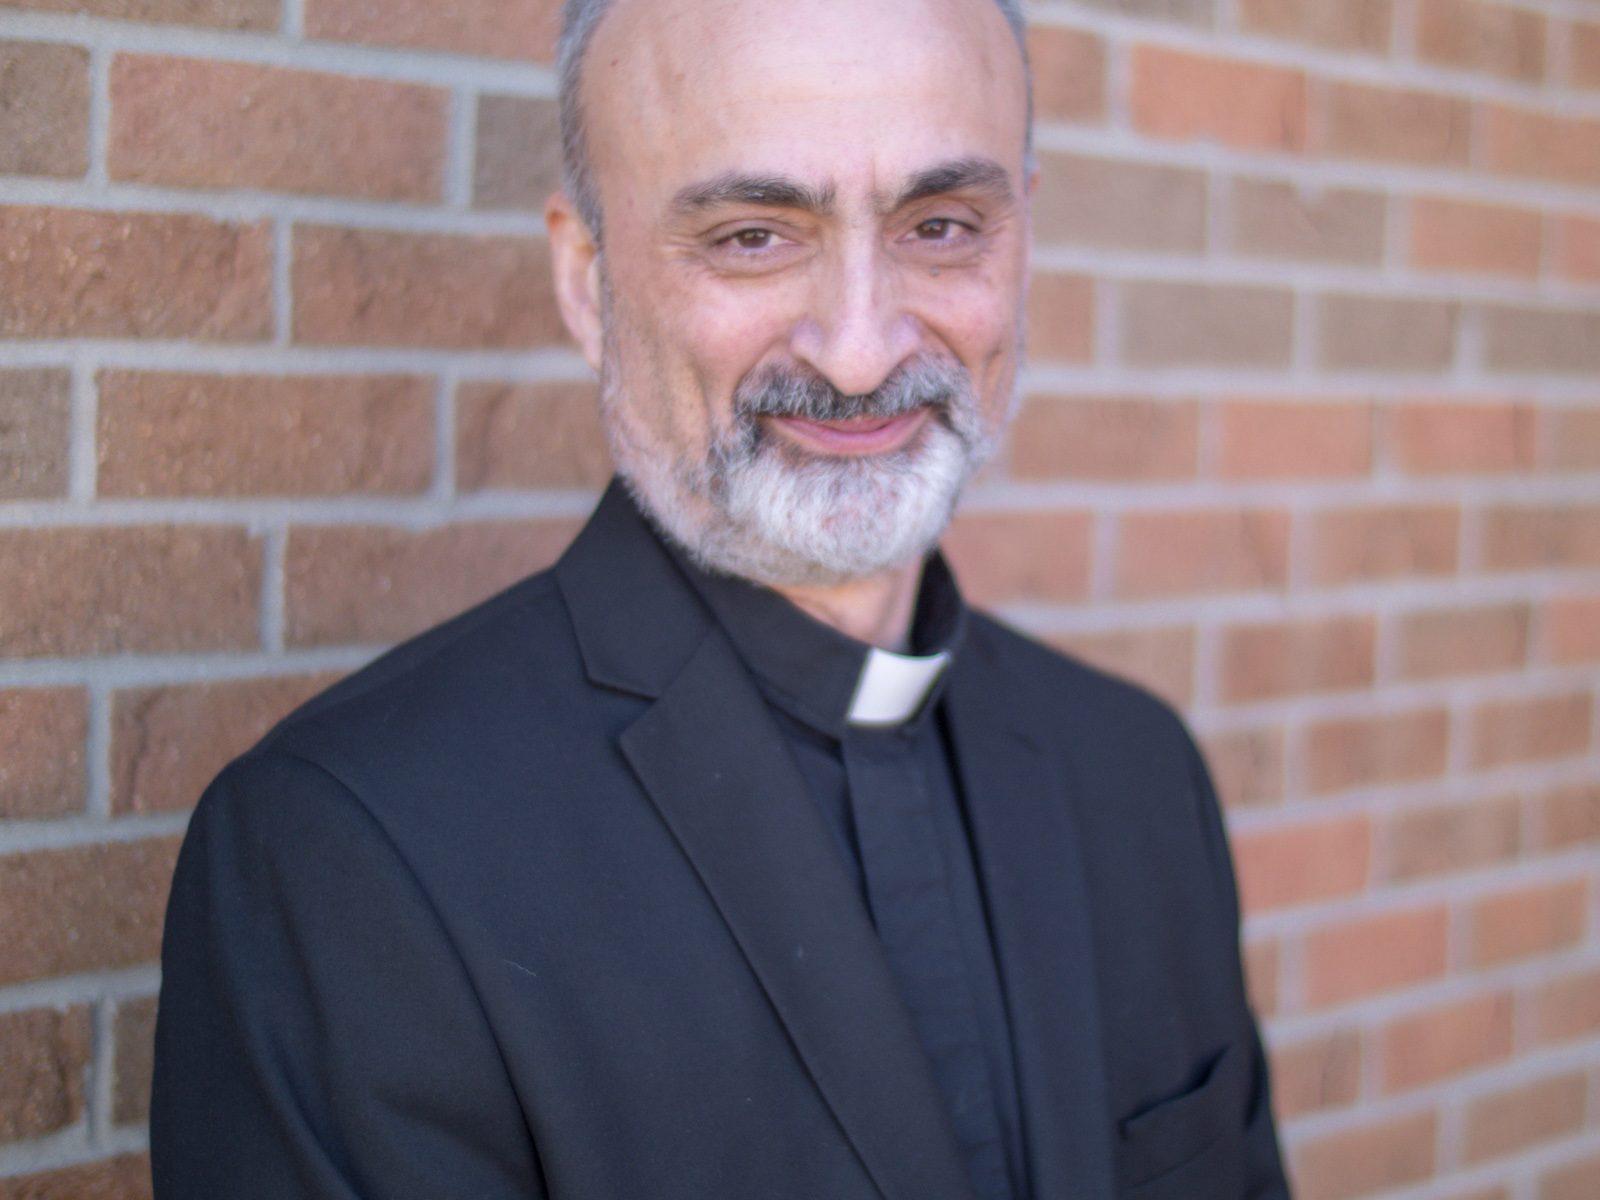 Fr. Mark George